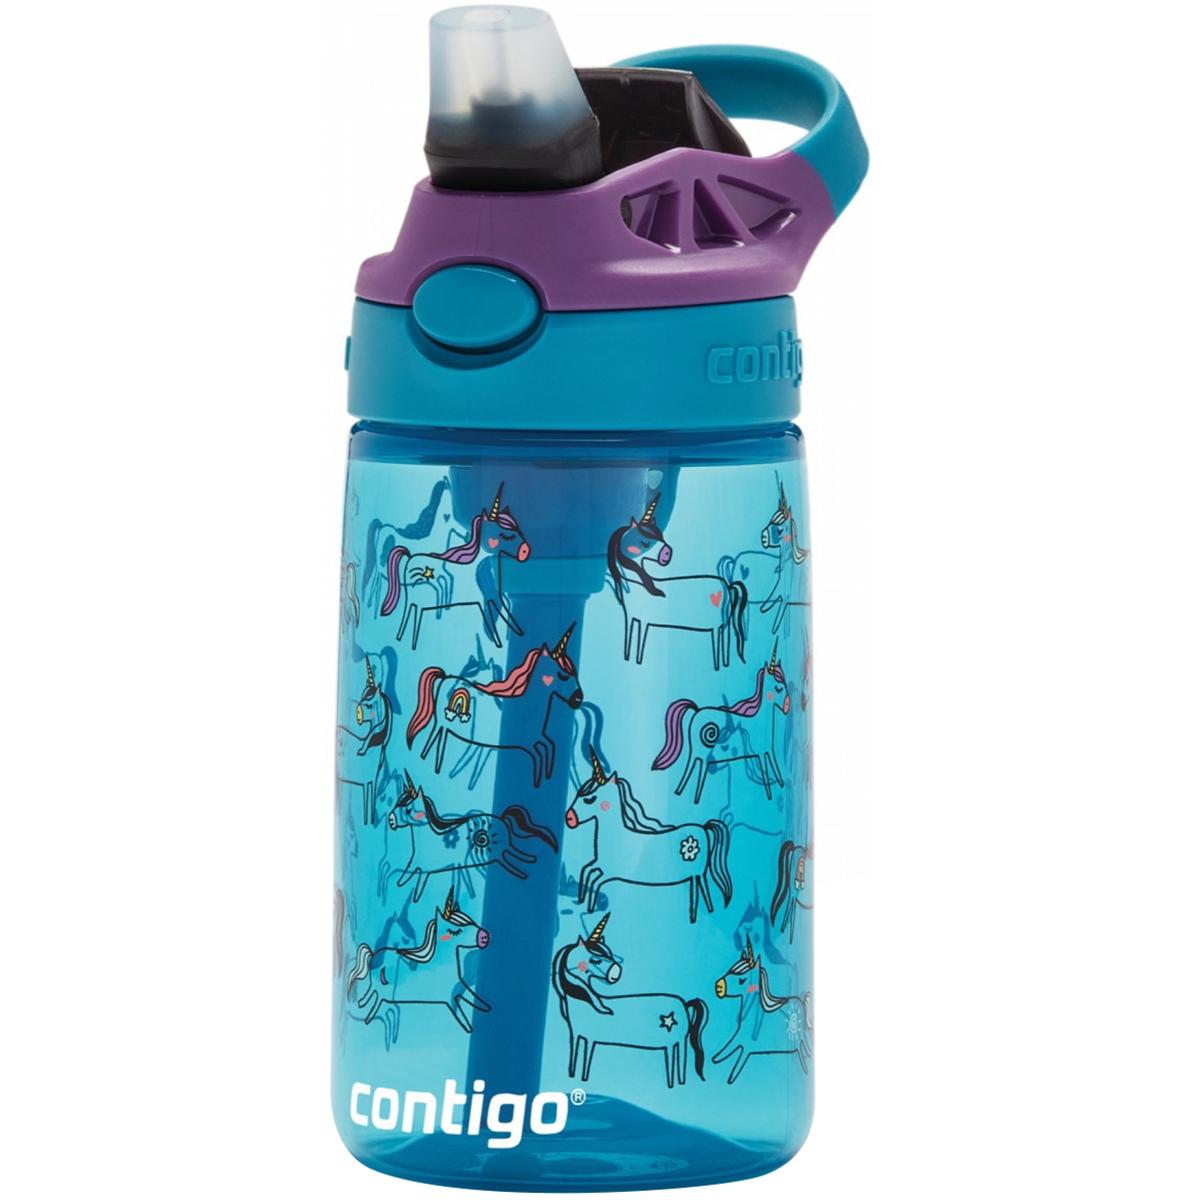 Contigo-Kid-039-s-14-oz-AutoSpout-Straw-Water-Bottle-with-Easy-Clean-Lid thumbnail 43